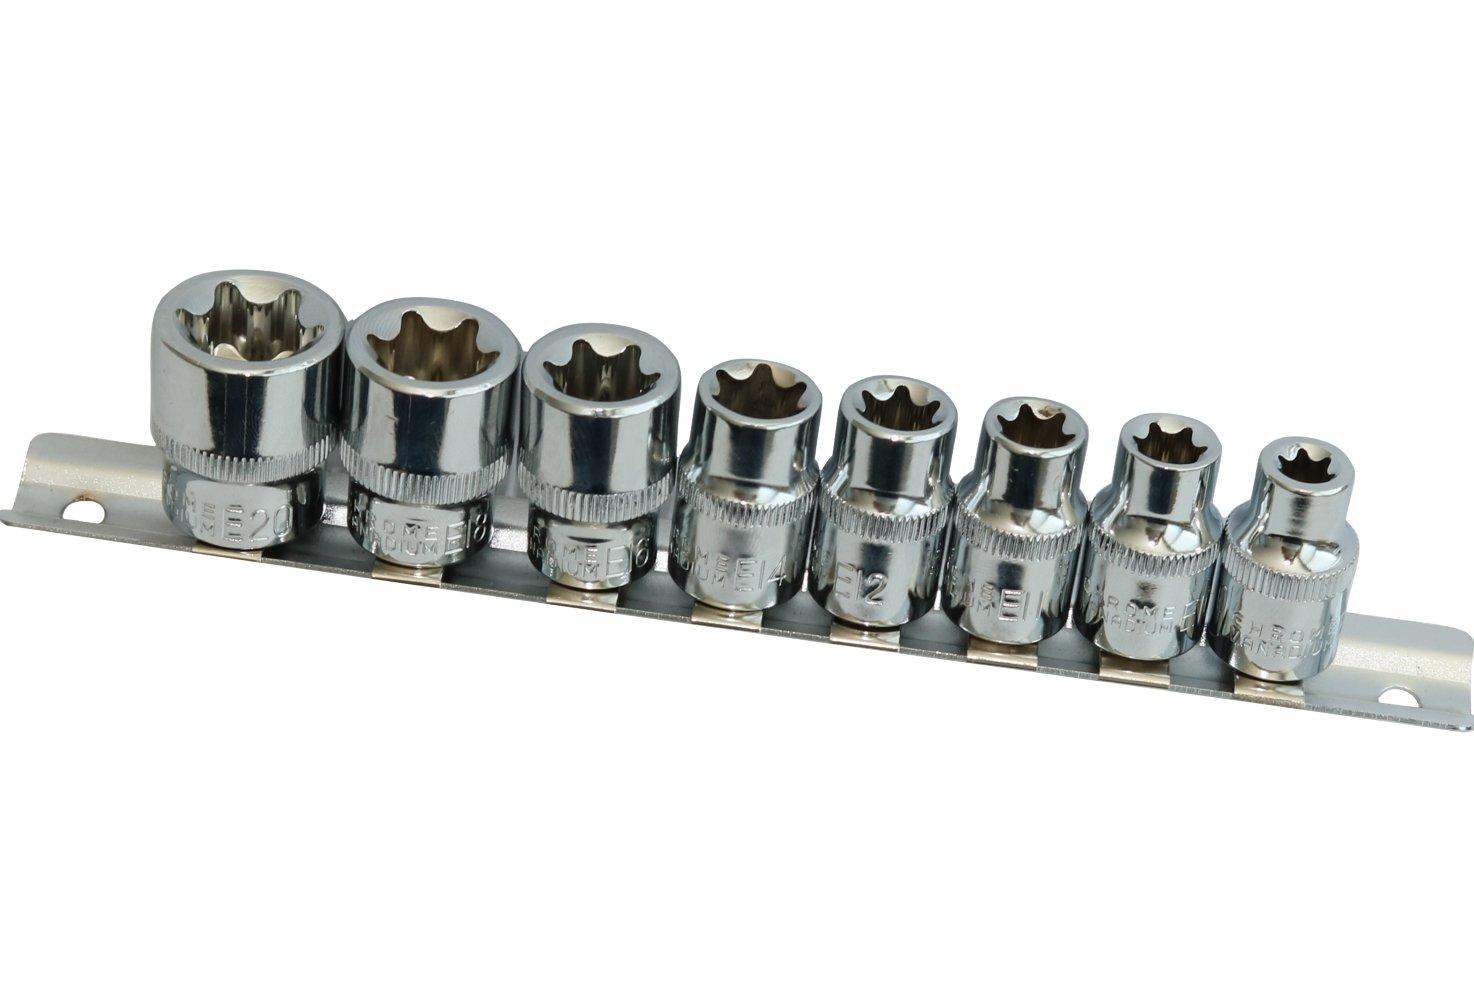 E14 E18 E16 AERZETIX: 8 Prese chiave a bussola 3//8 E-Torx E8 E11 E10 E12 E20 C17827